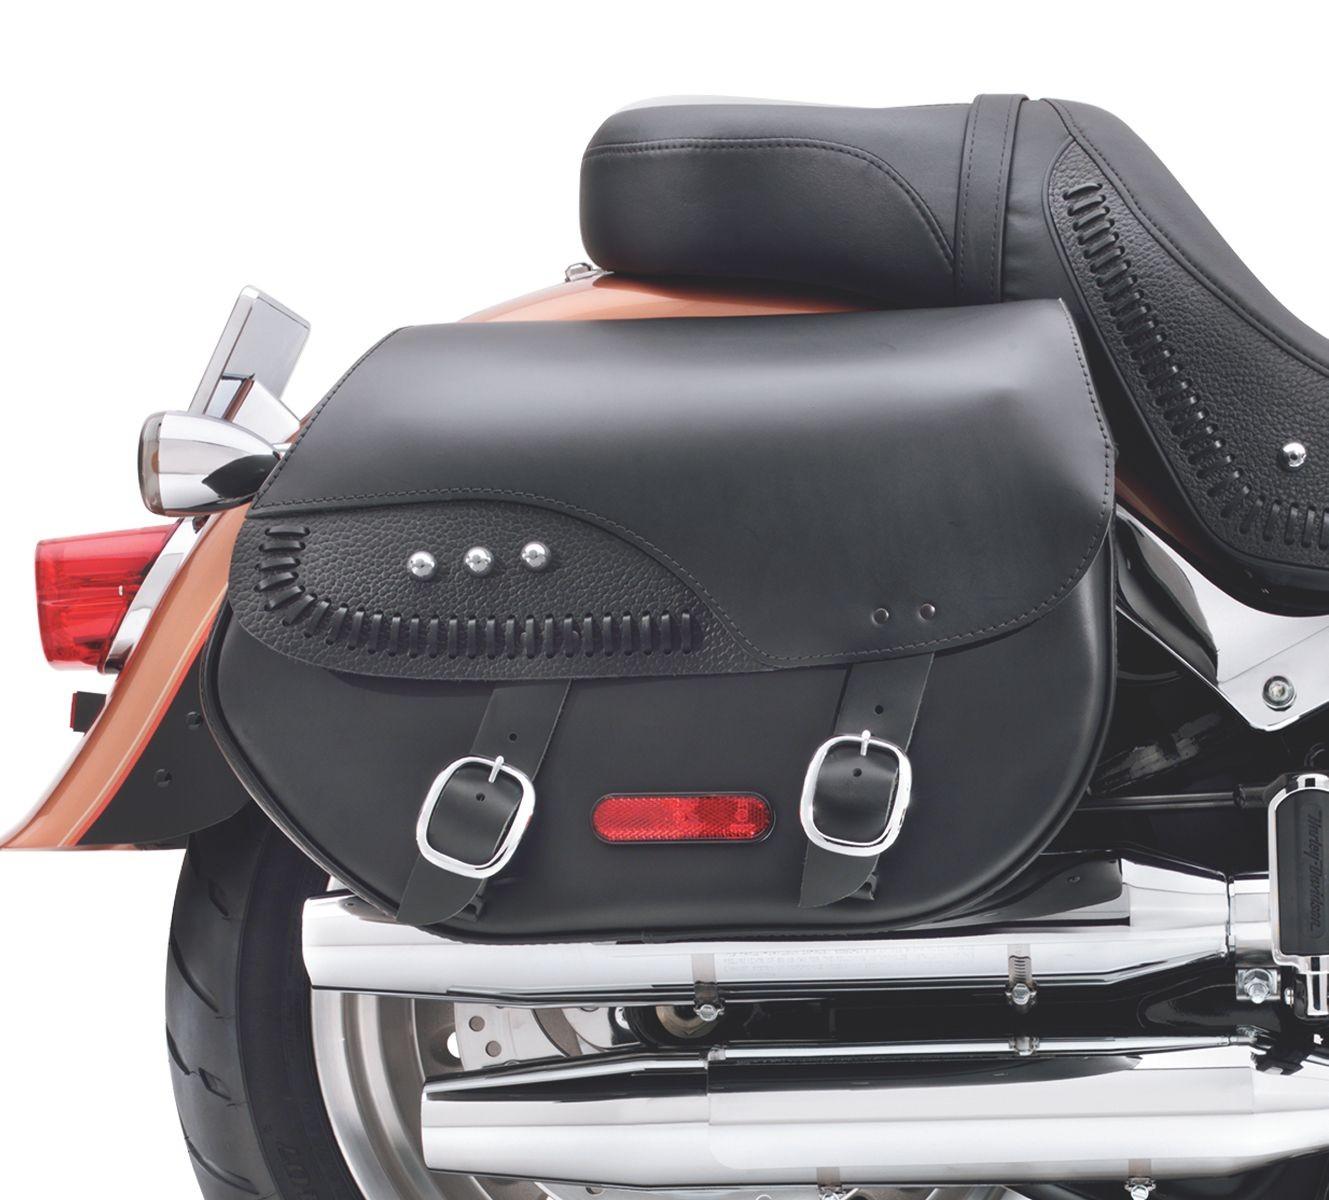 88306 07a Harley Davidson H D Detachables Leather Saddlebags Protectant Manchester